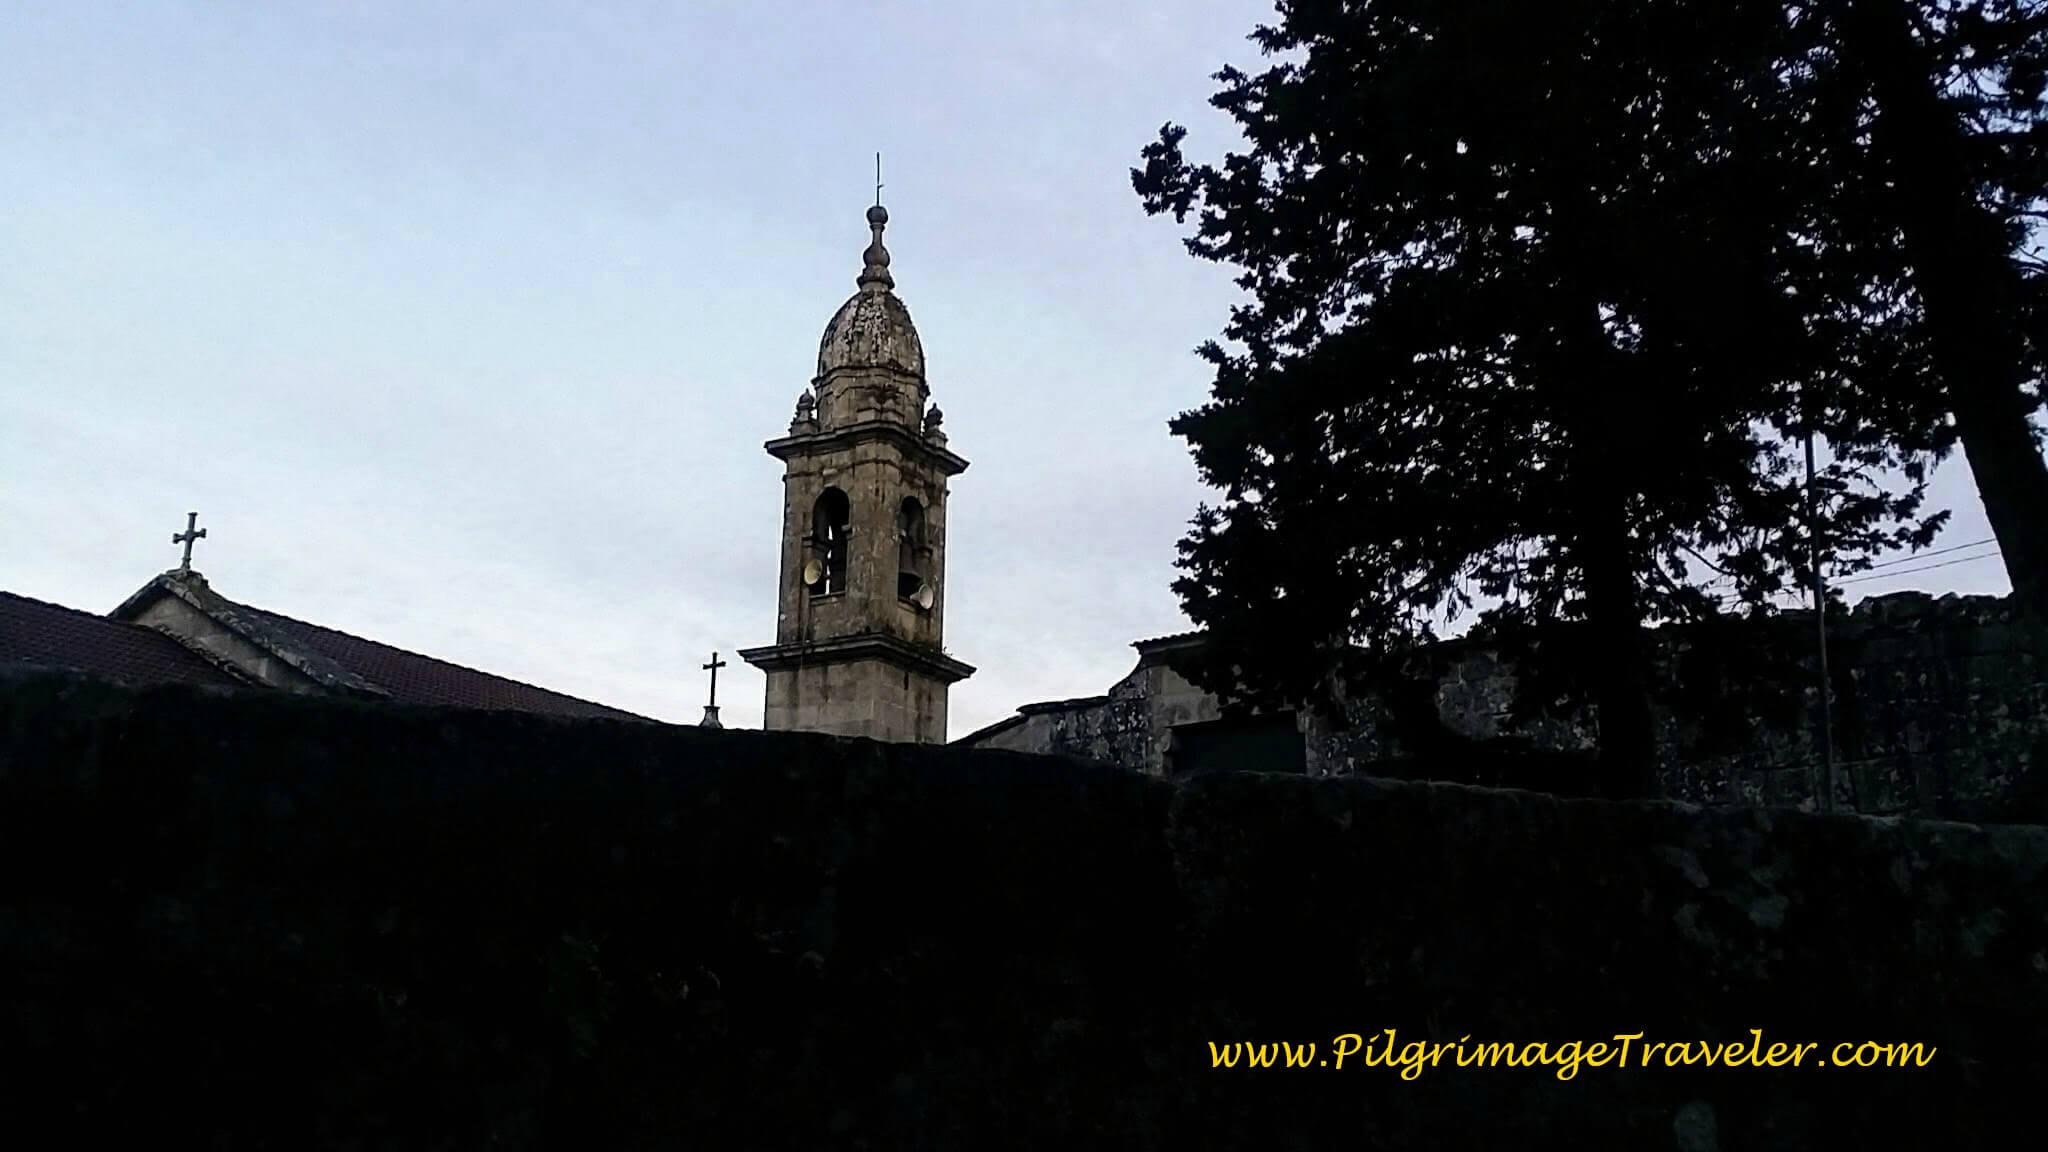 Iglesia Santa Maria Alba Silhouette on day twenty-three, Camino Portugués